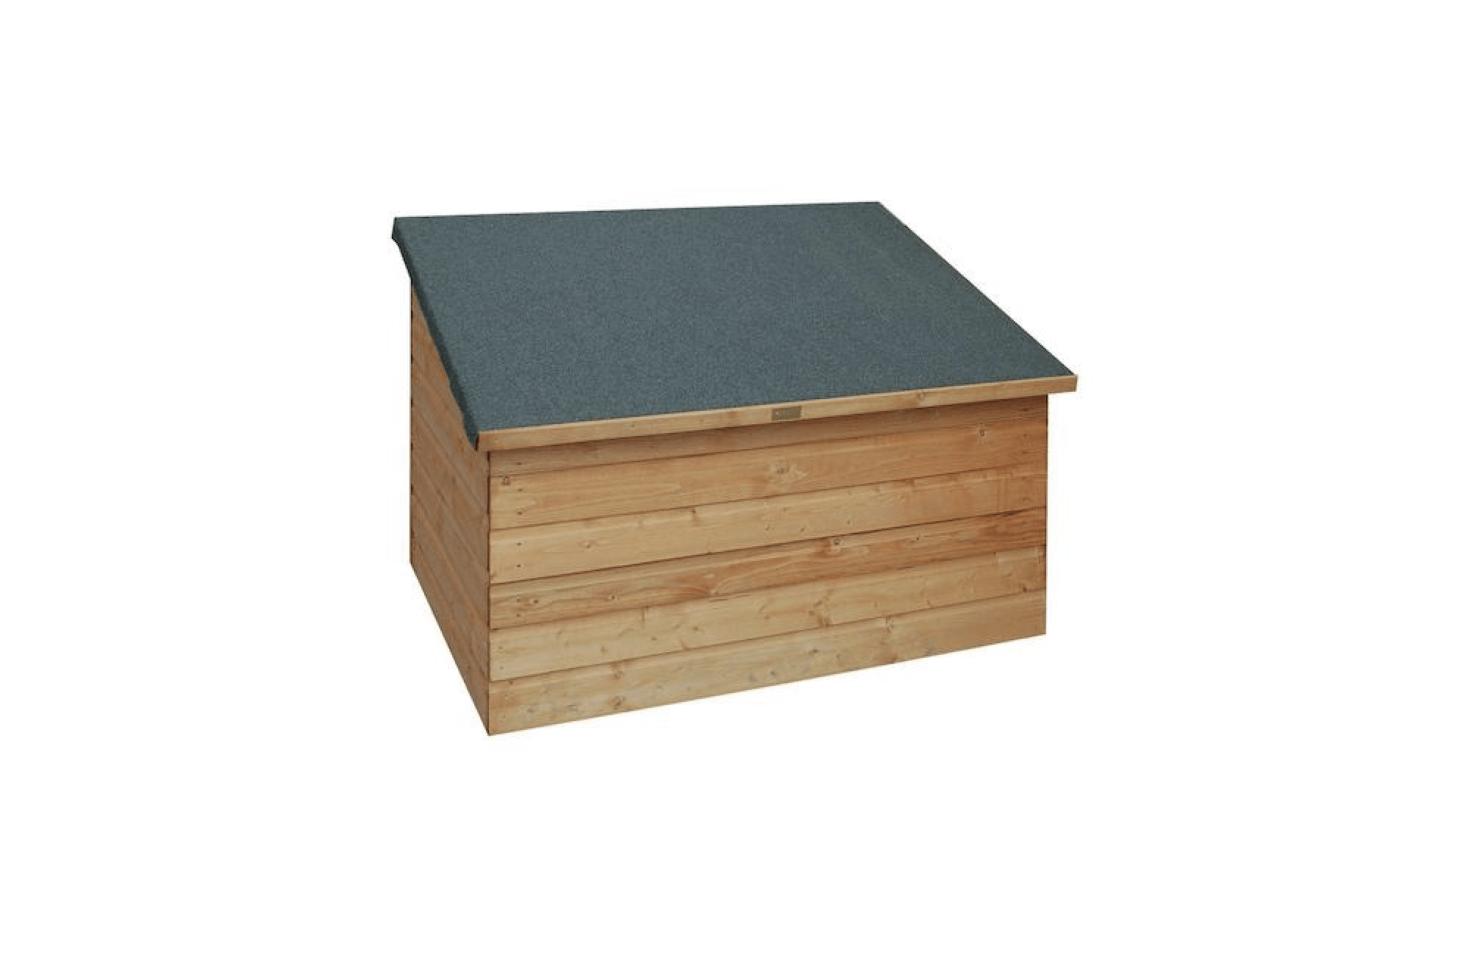 10 Easy Pieces: Deck Boxes - Gardenista